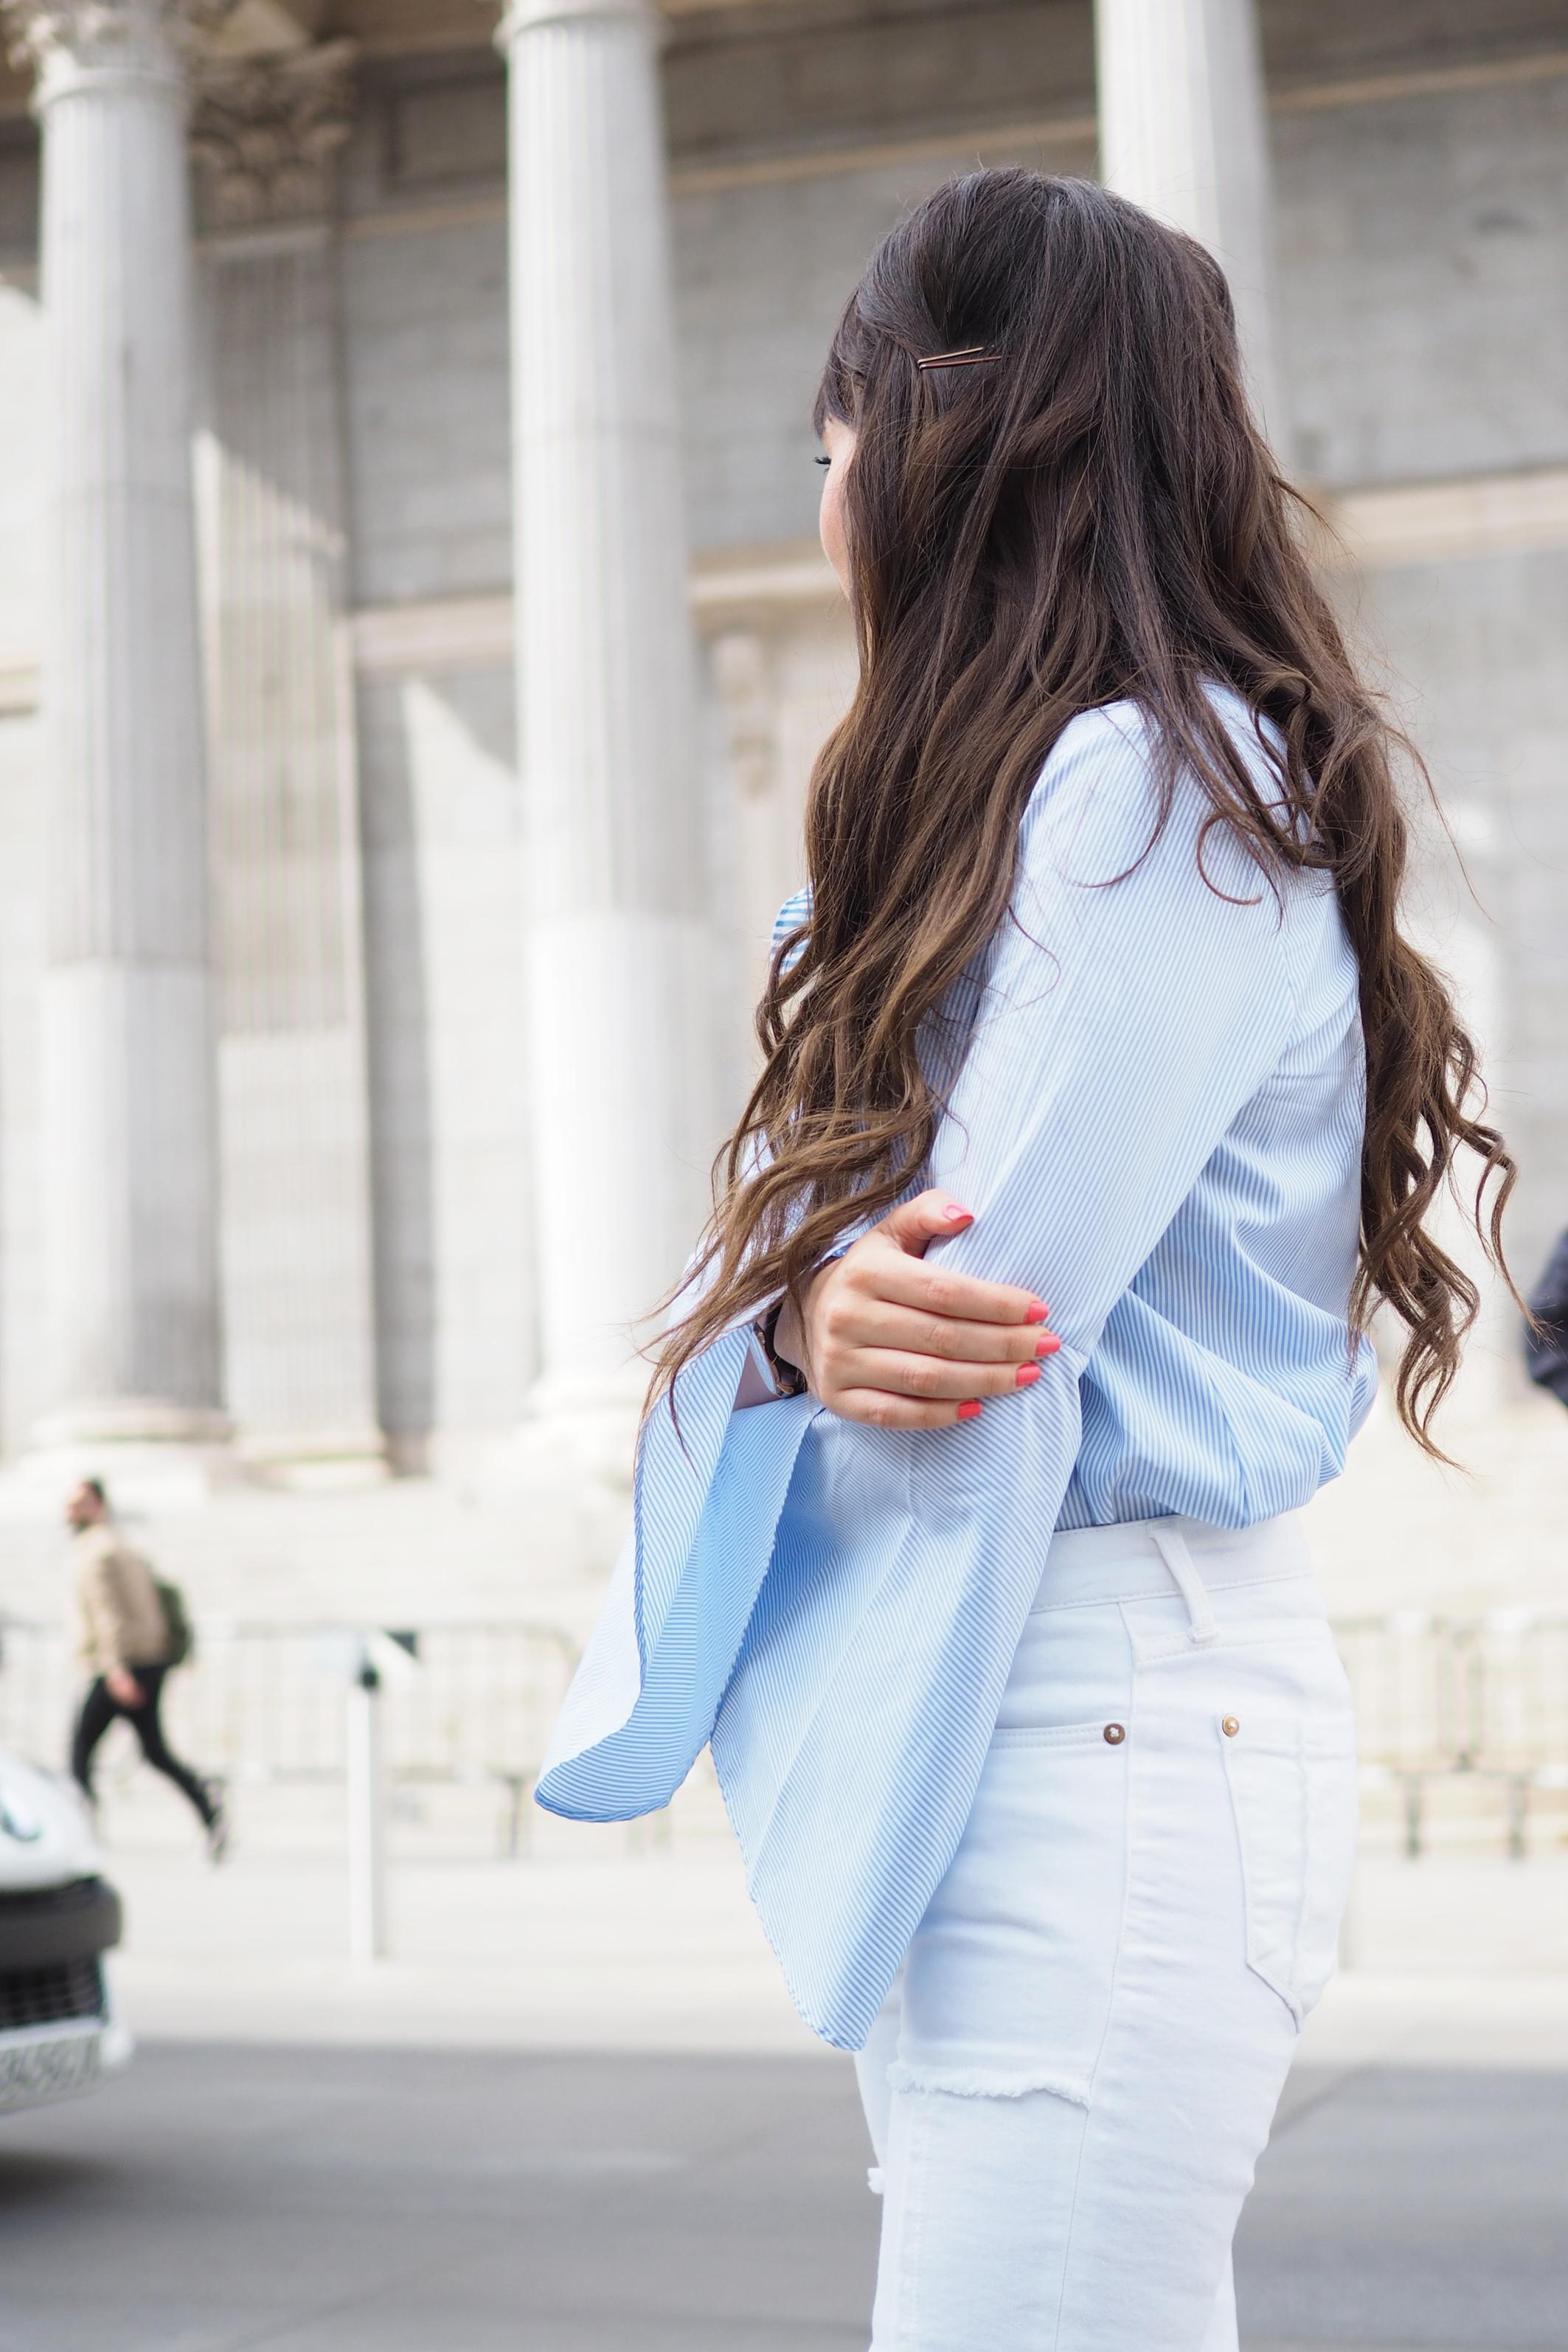 Flared-sleeves_patchwork-pants_skinny-scarf_spring-street-style_(10)